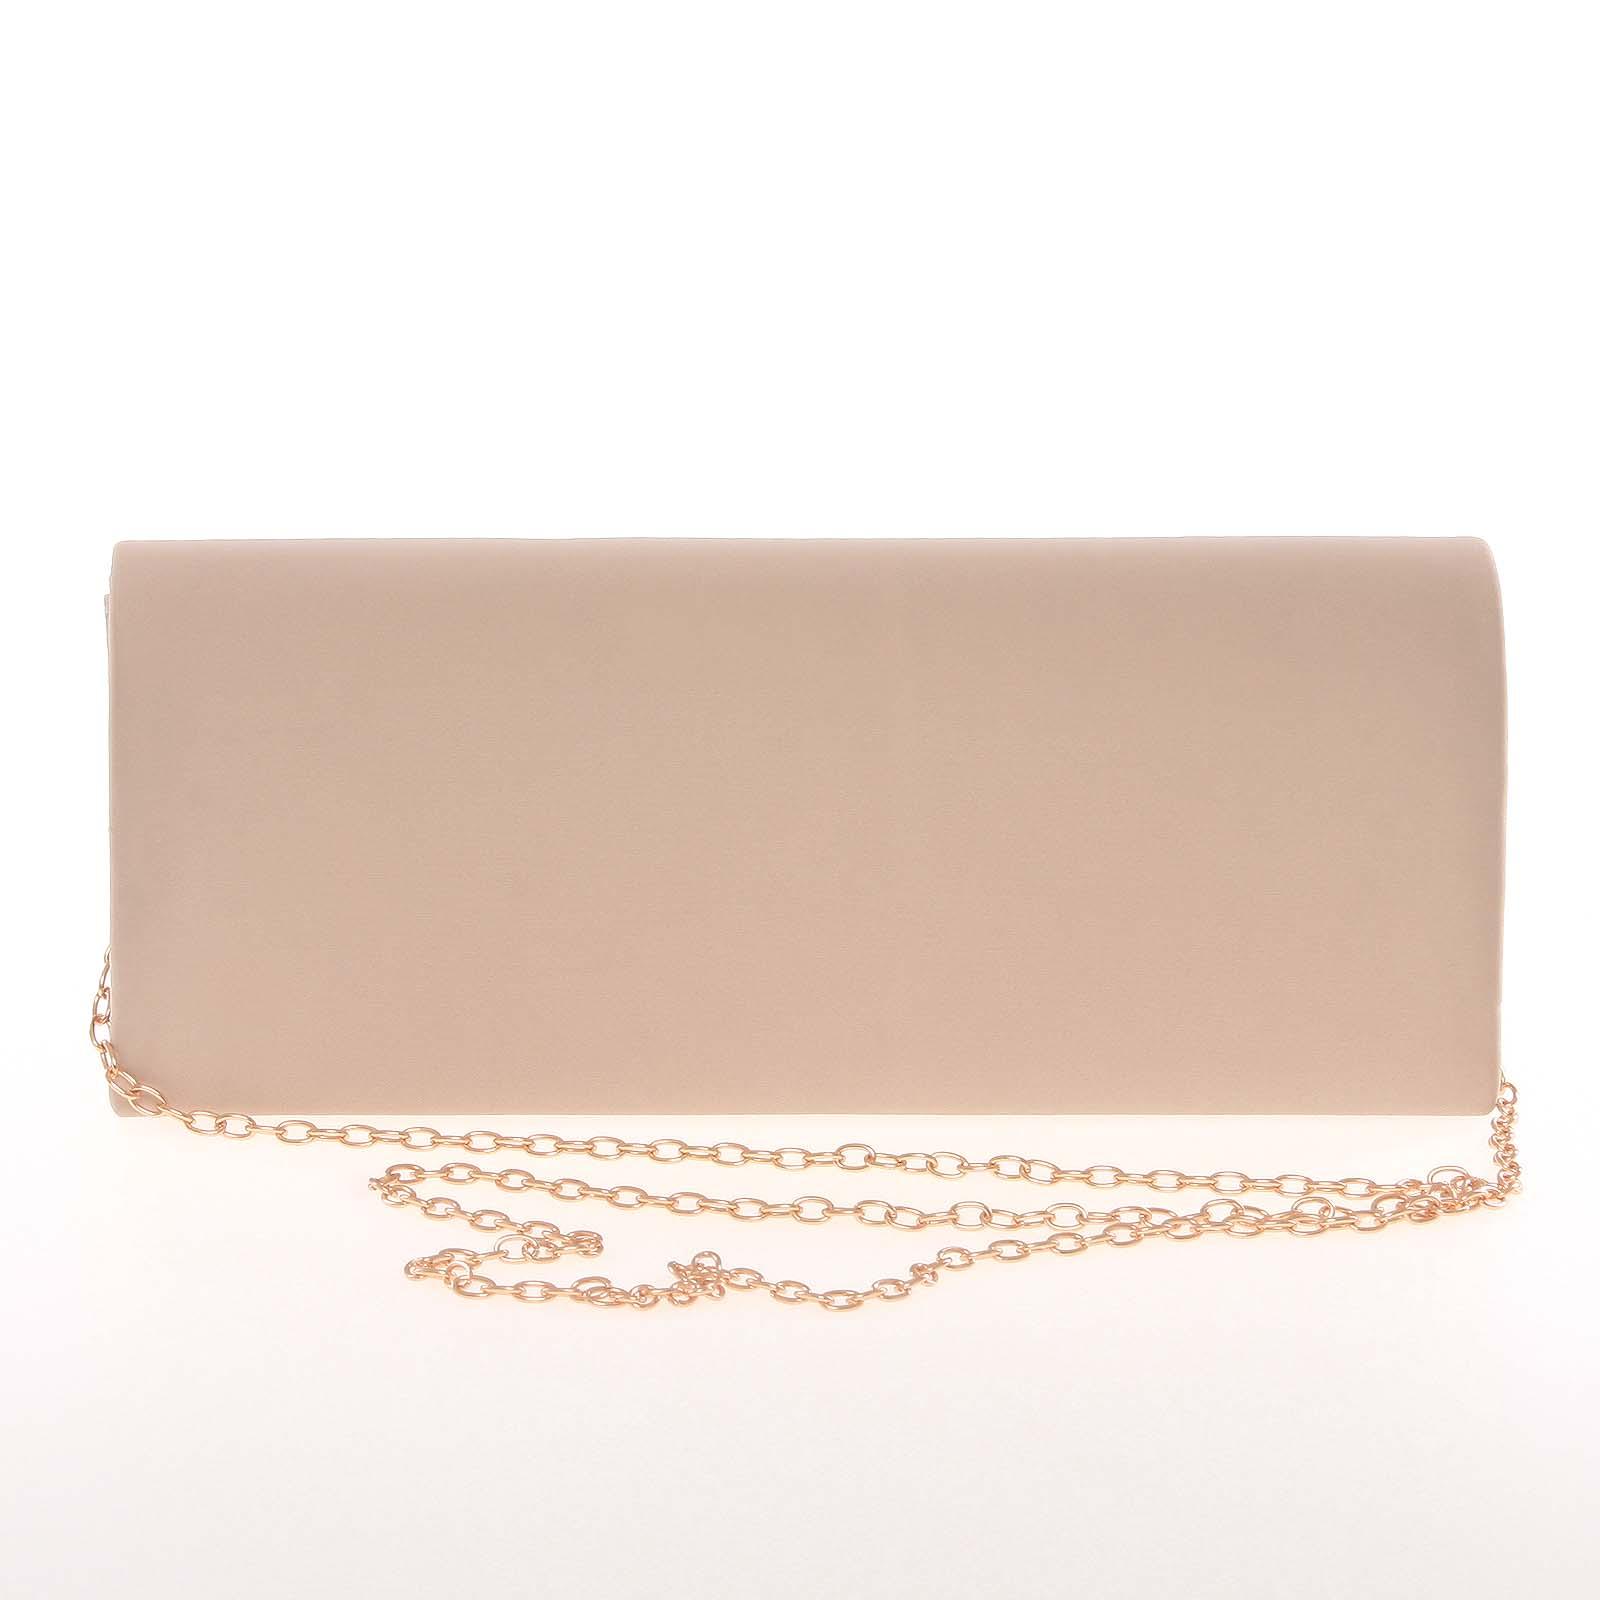 Decentná saténová listová kabelka tmavá marhuľová - Delami P355